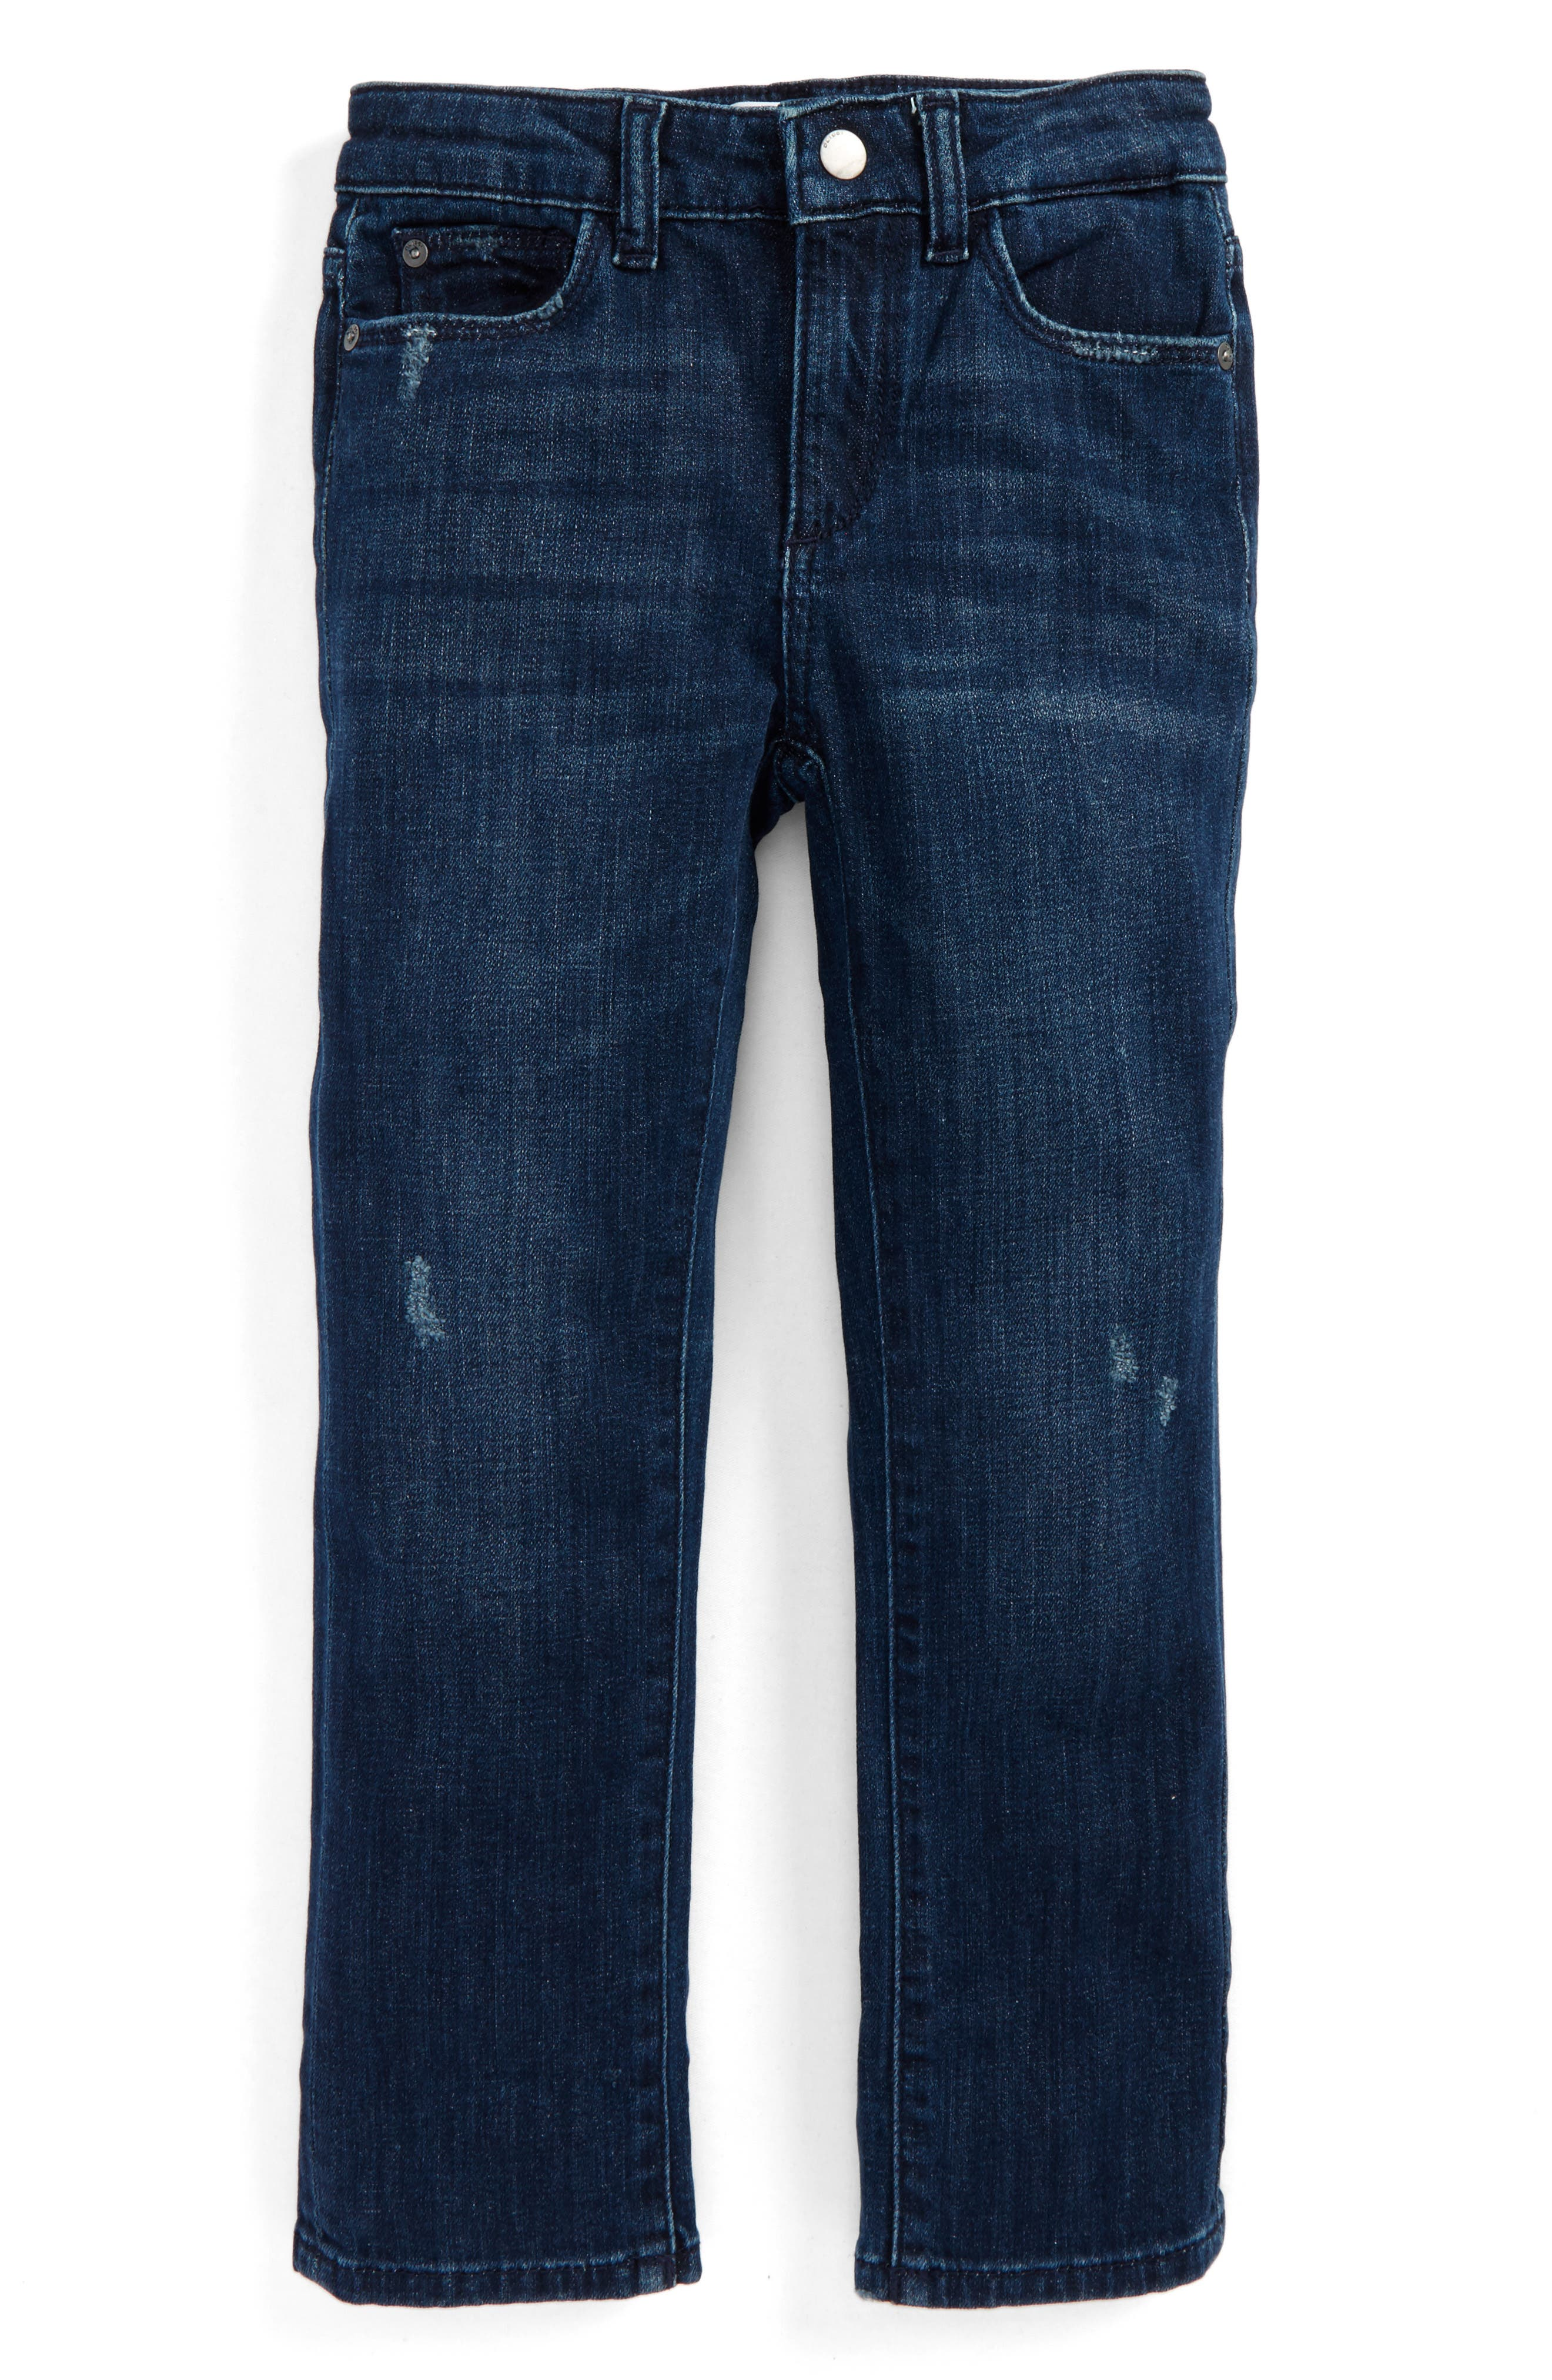 Main Image - DL1961 Brady Slim Fit Jeans (Toddler Boys & Little Boys)